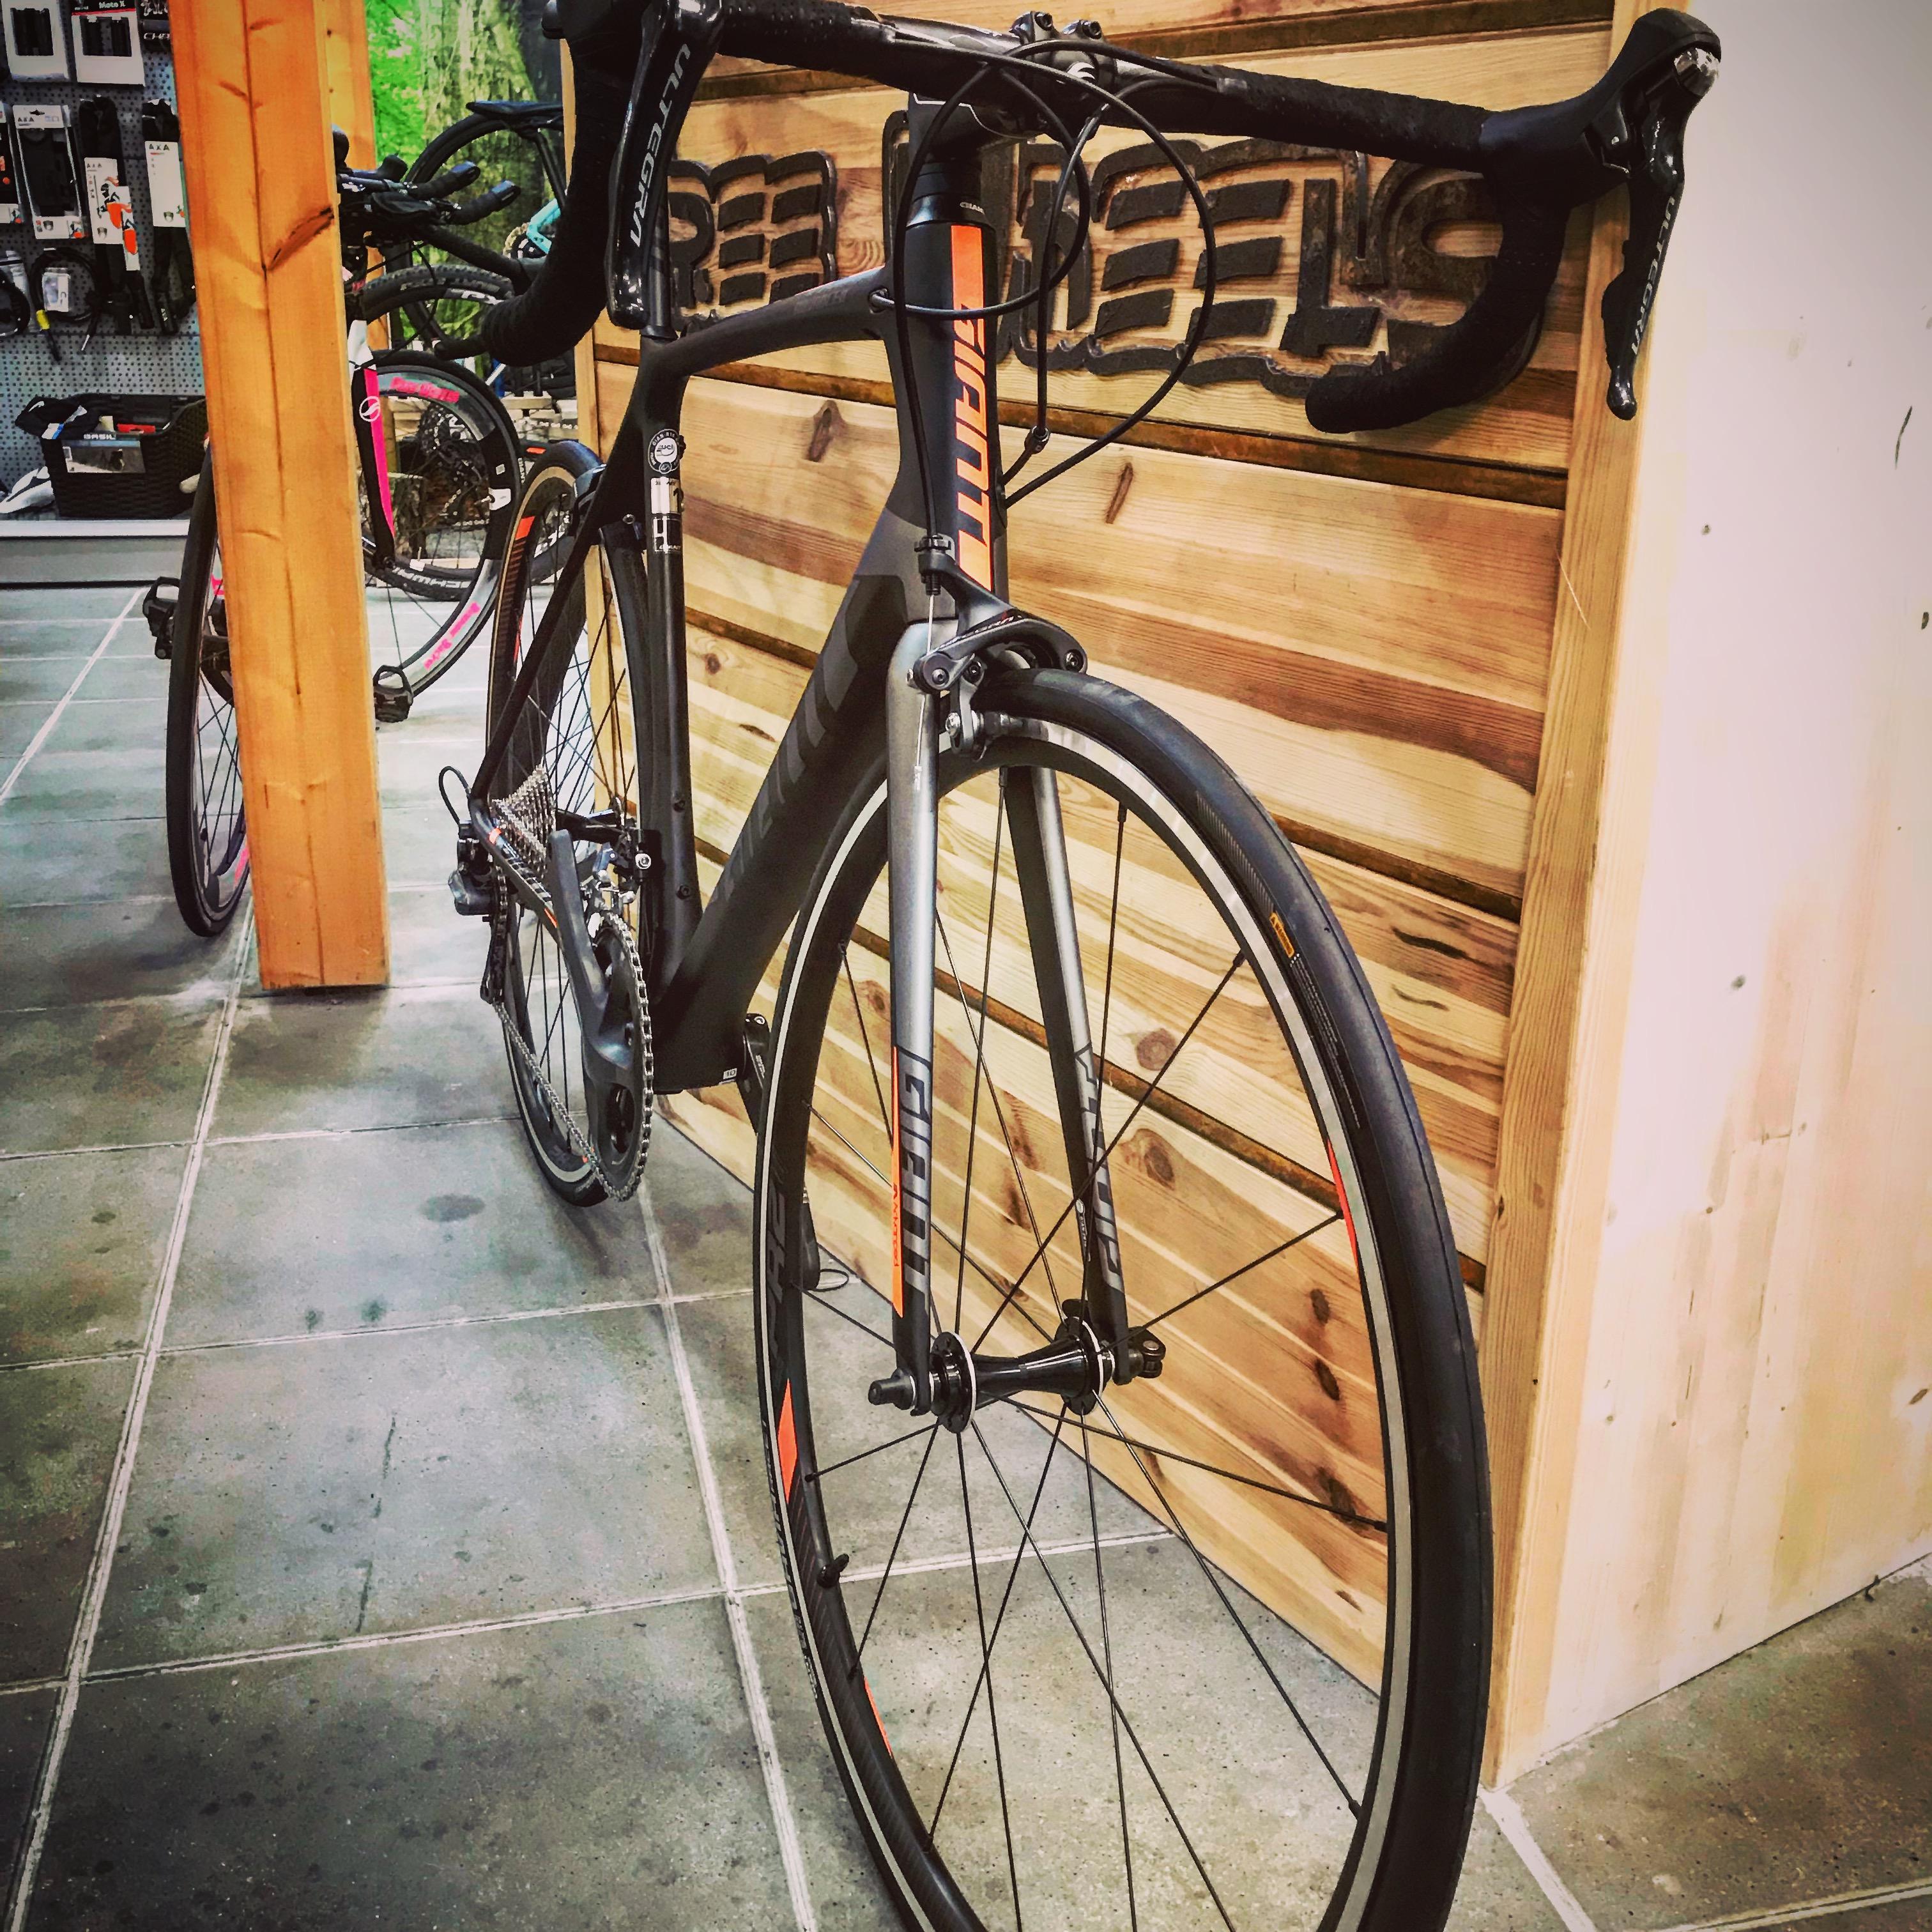 #free_wheels_shop, #pillnach, #kirchroth, #hdg, #jagdfieber, #ridegiant, #rideshimano, #ridelife